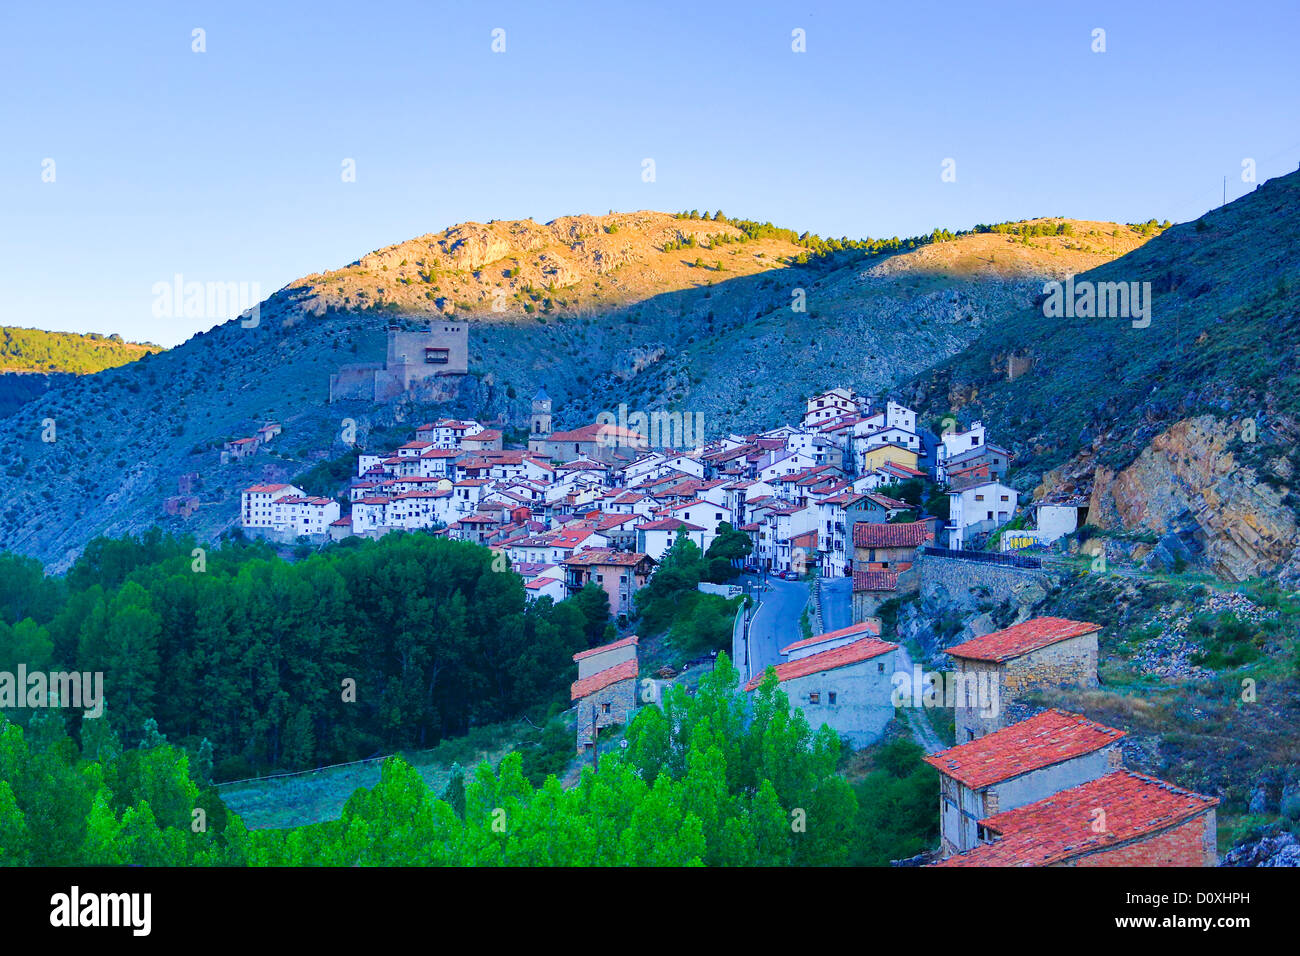 Spanien, Europa, Aragon, Teruel, Provinz, Maestrazgo, Alcala De La Selva, Teruel, Architektur, Burg, Landschaft, Stockbild